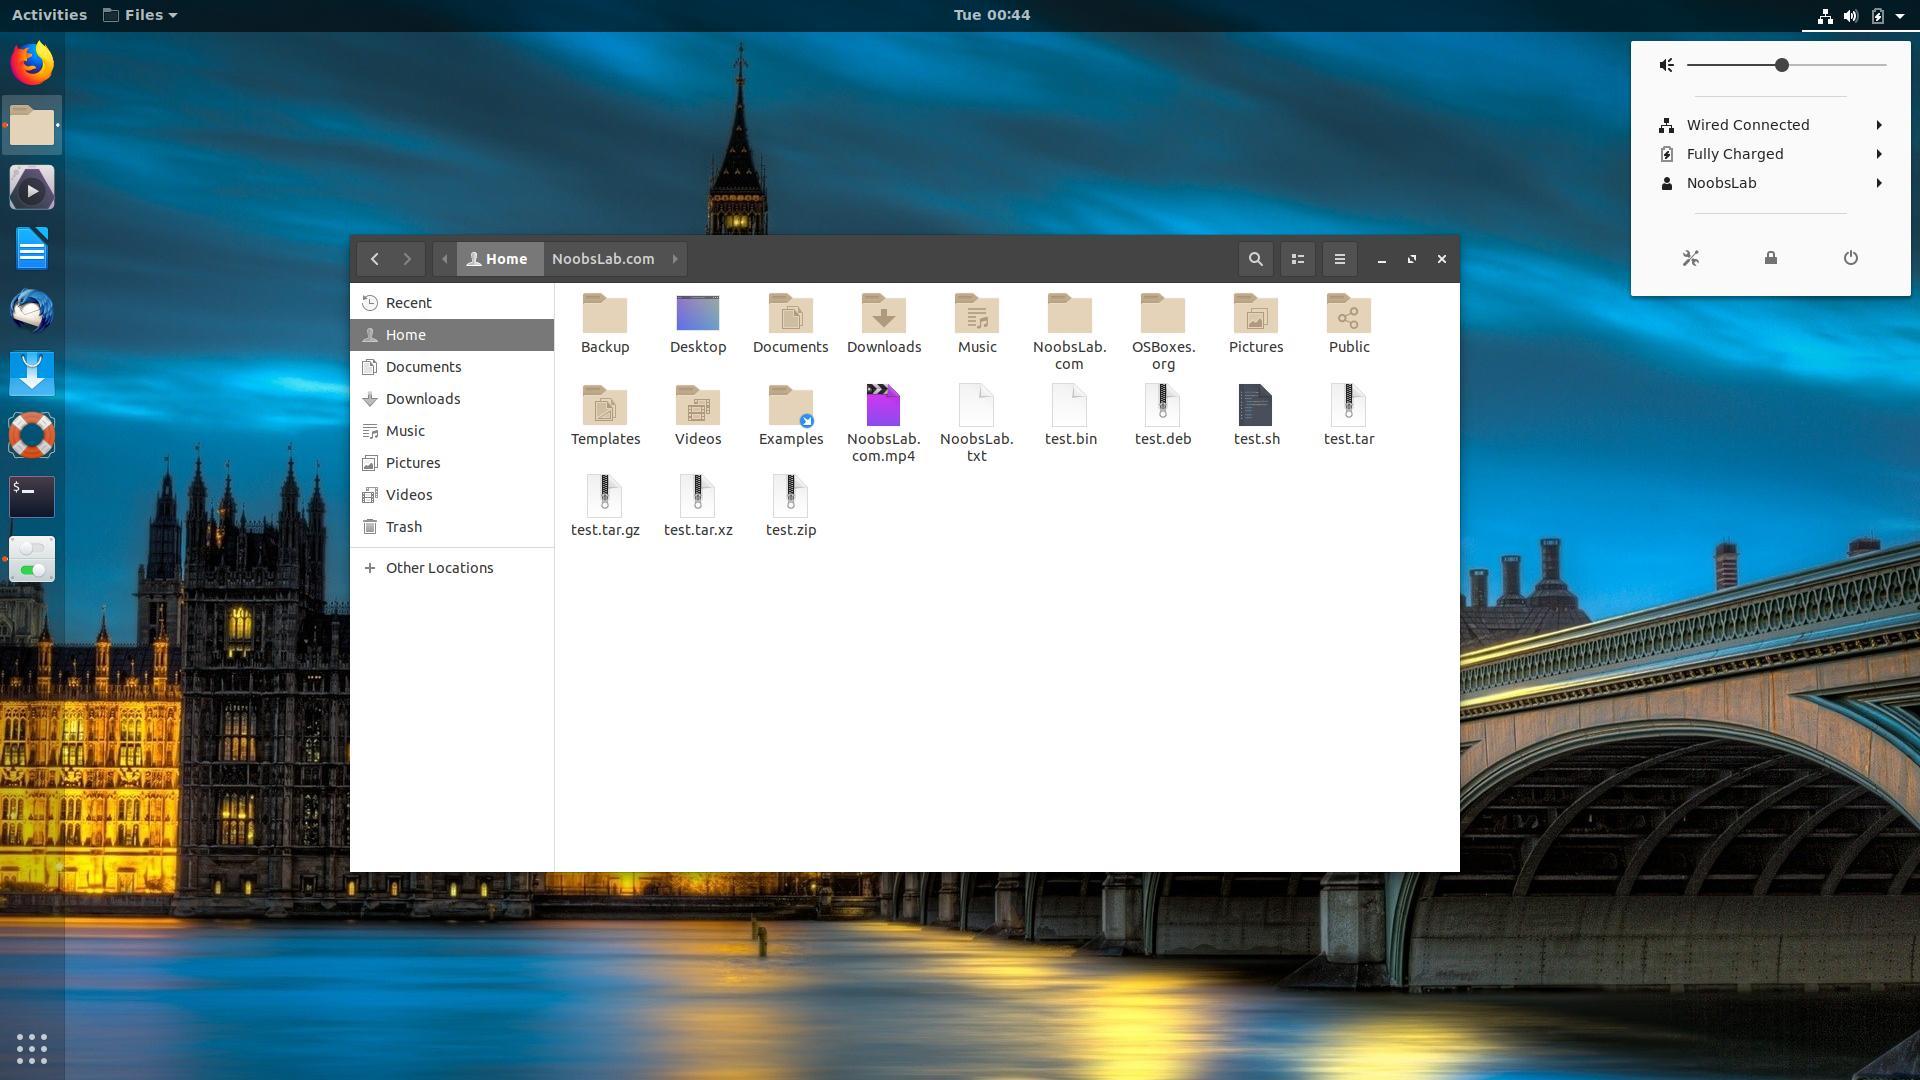 Stylish Gtk Themes Makes Your Linux Desktop Look Stylish